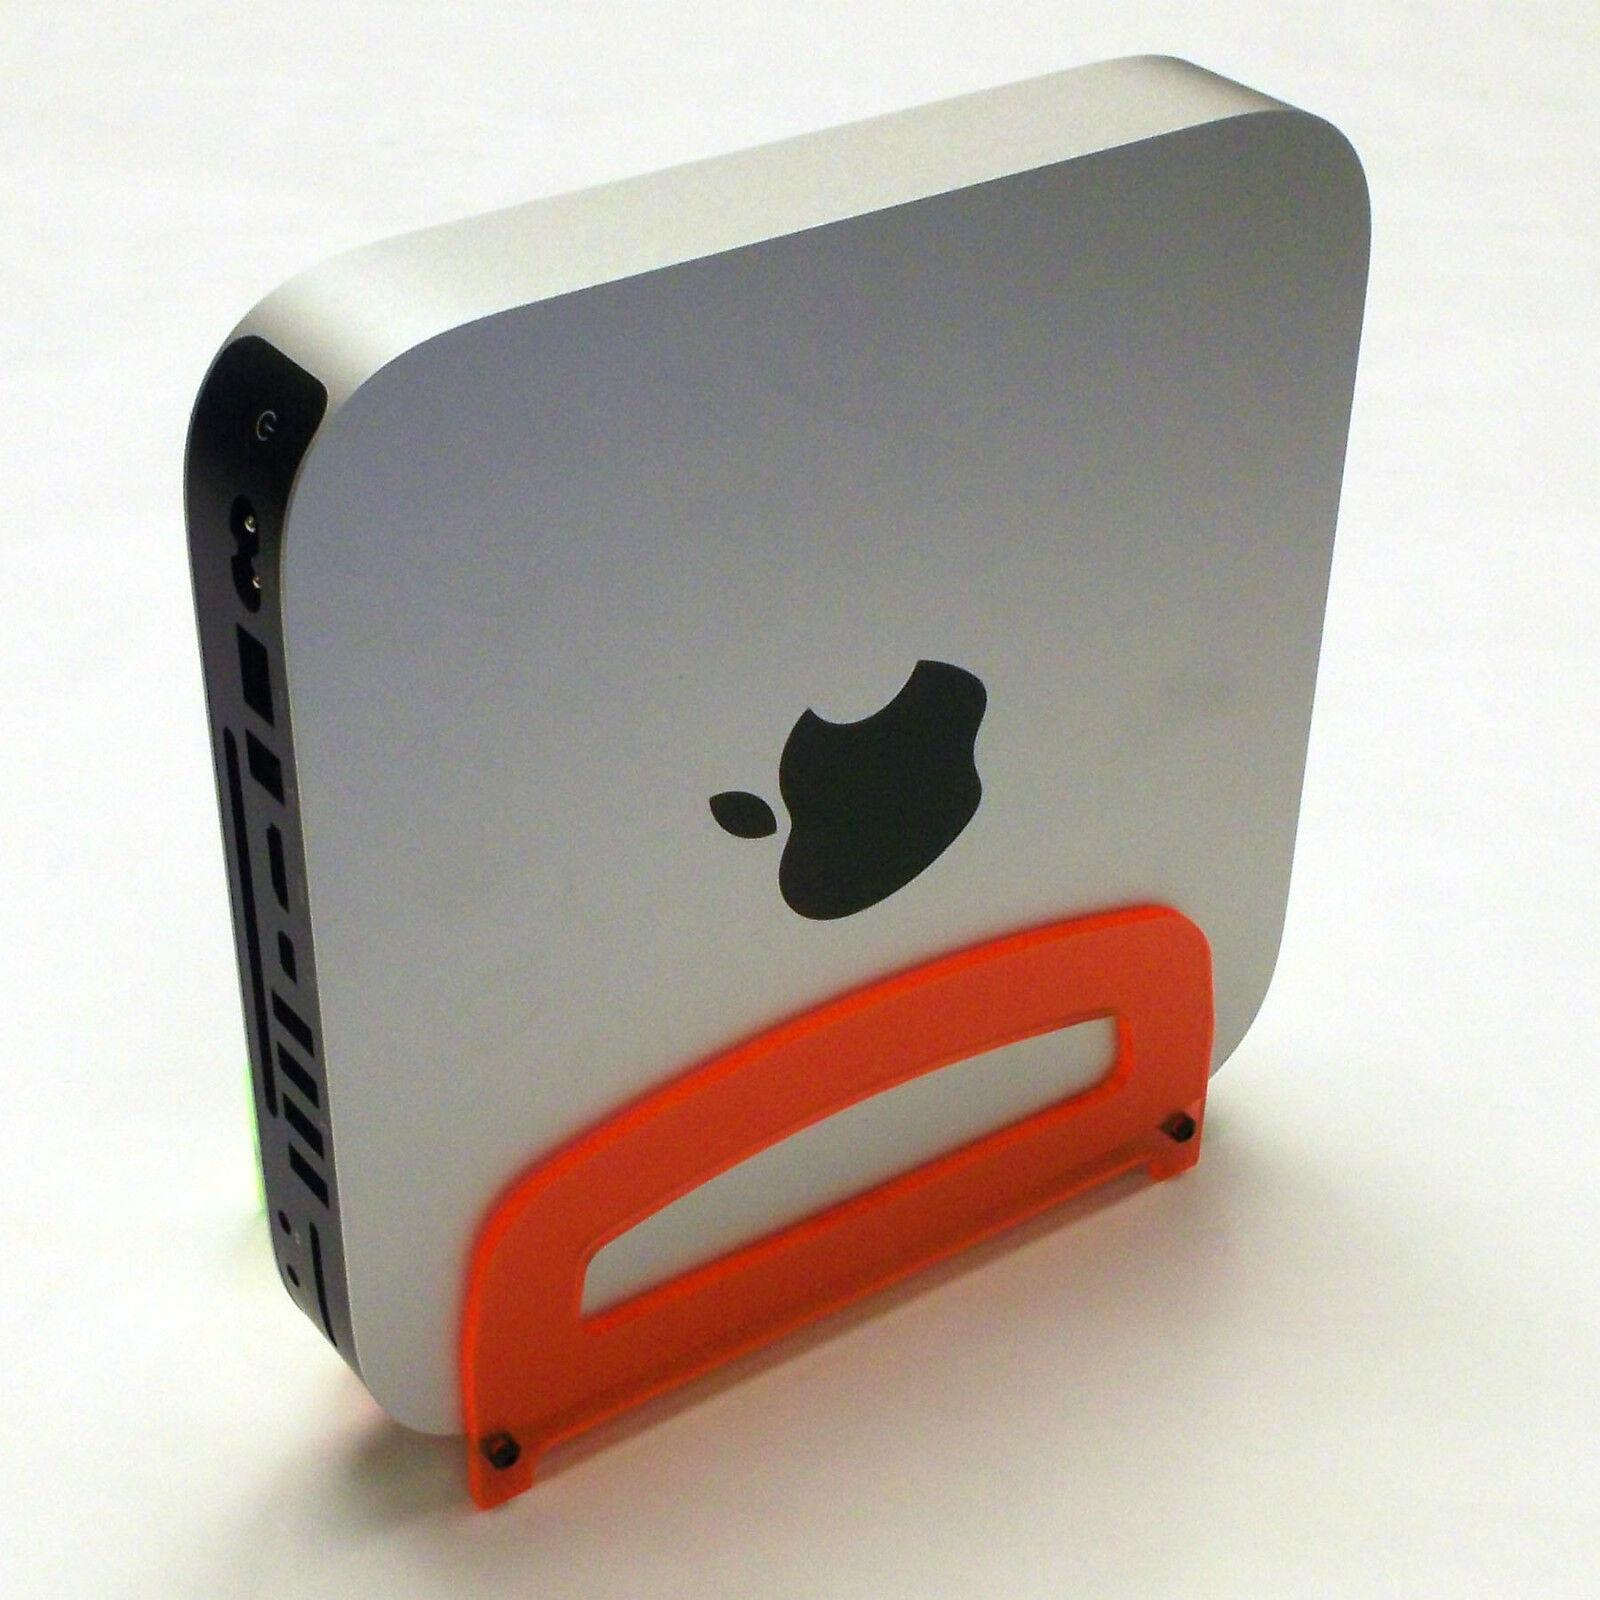 Mini Mac Time Capsule Rasberry Red Apple Acrylic Computer Stand 2010+